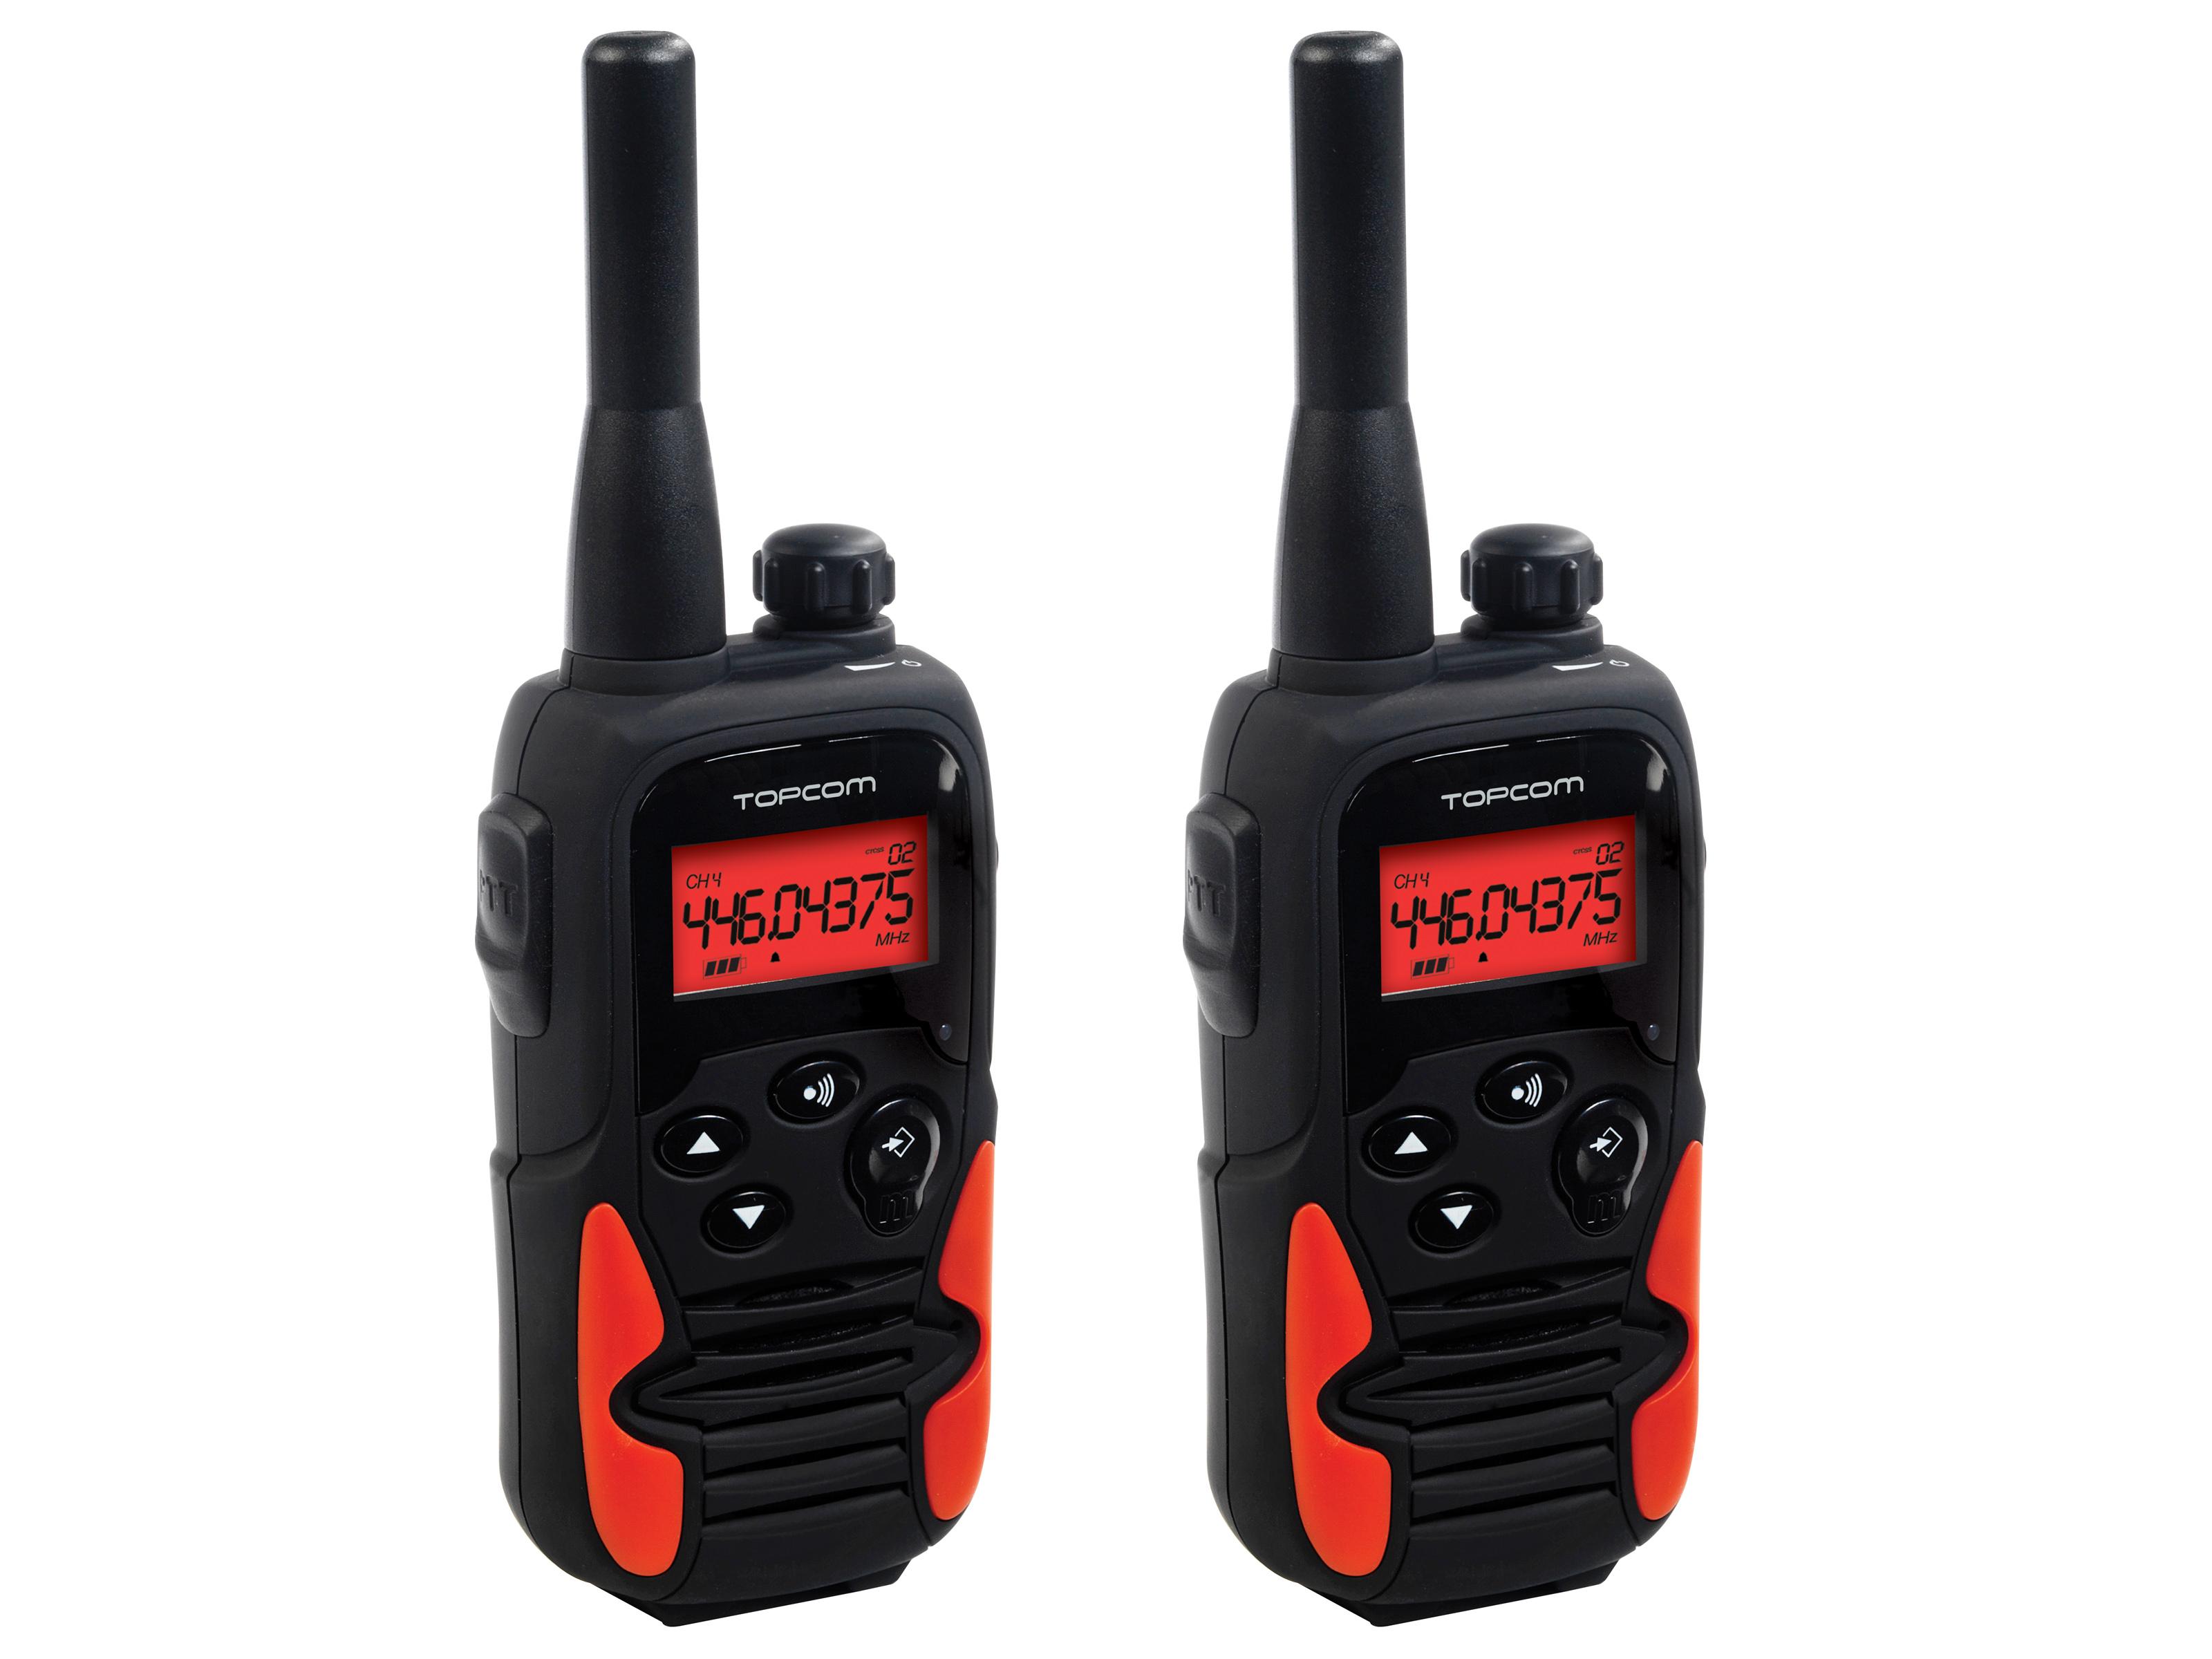 Topcom Twintalker 9500 8canali 446MHz Nero, Rosso ricetrasmittente